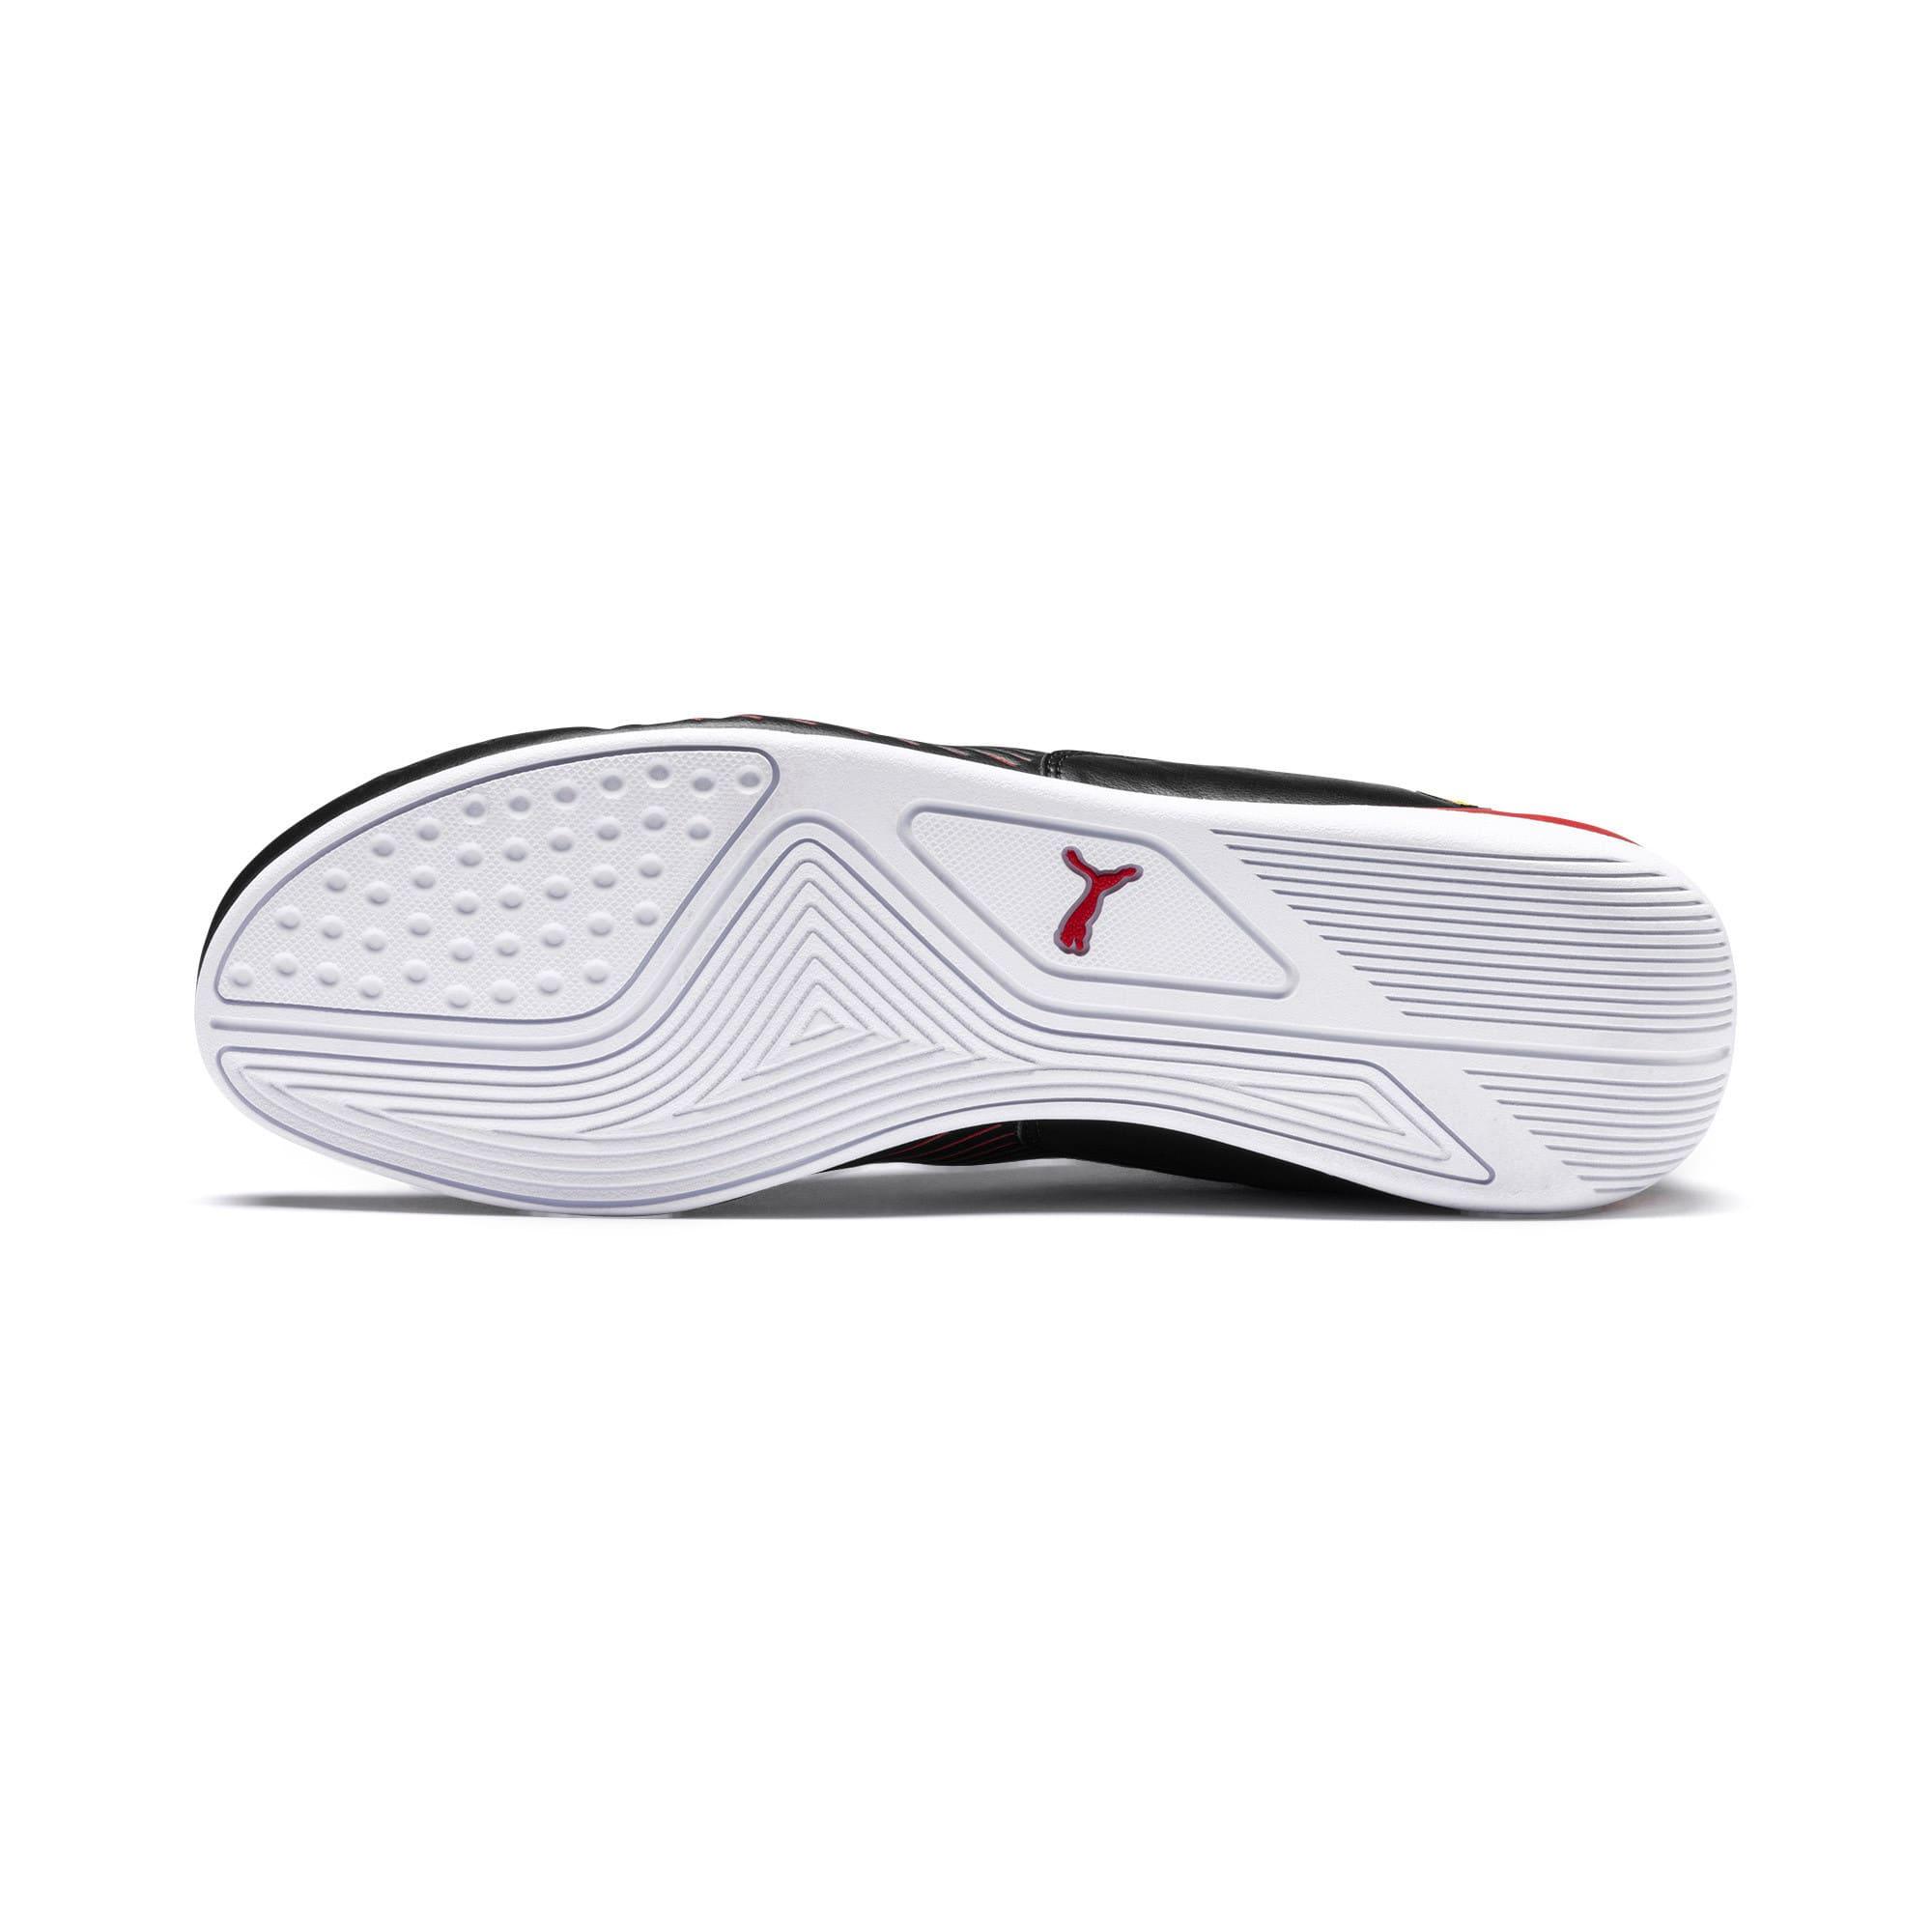 Thumbnail 3 of Scuderia Ferrari Drift Cat 7S Ultra Men's Shoes, Puma Black-Rosso Corsa, medium